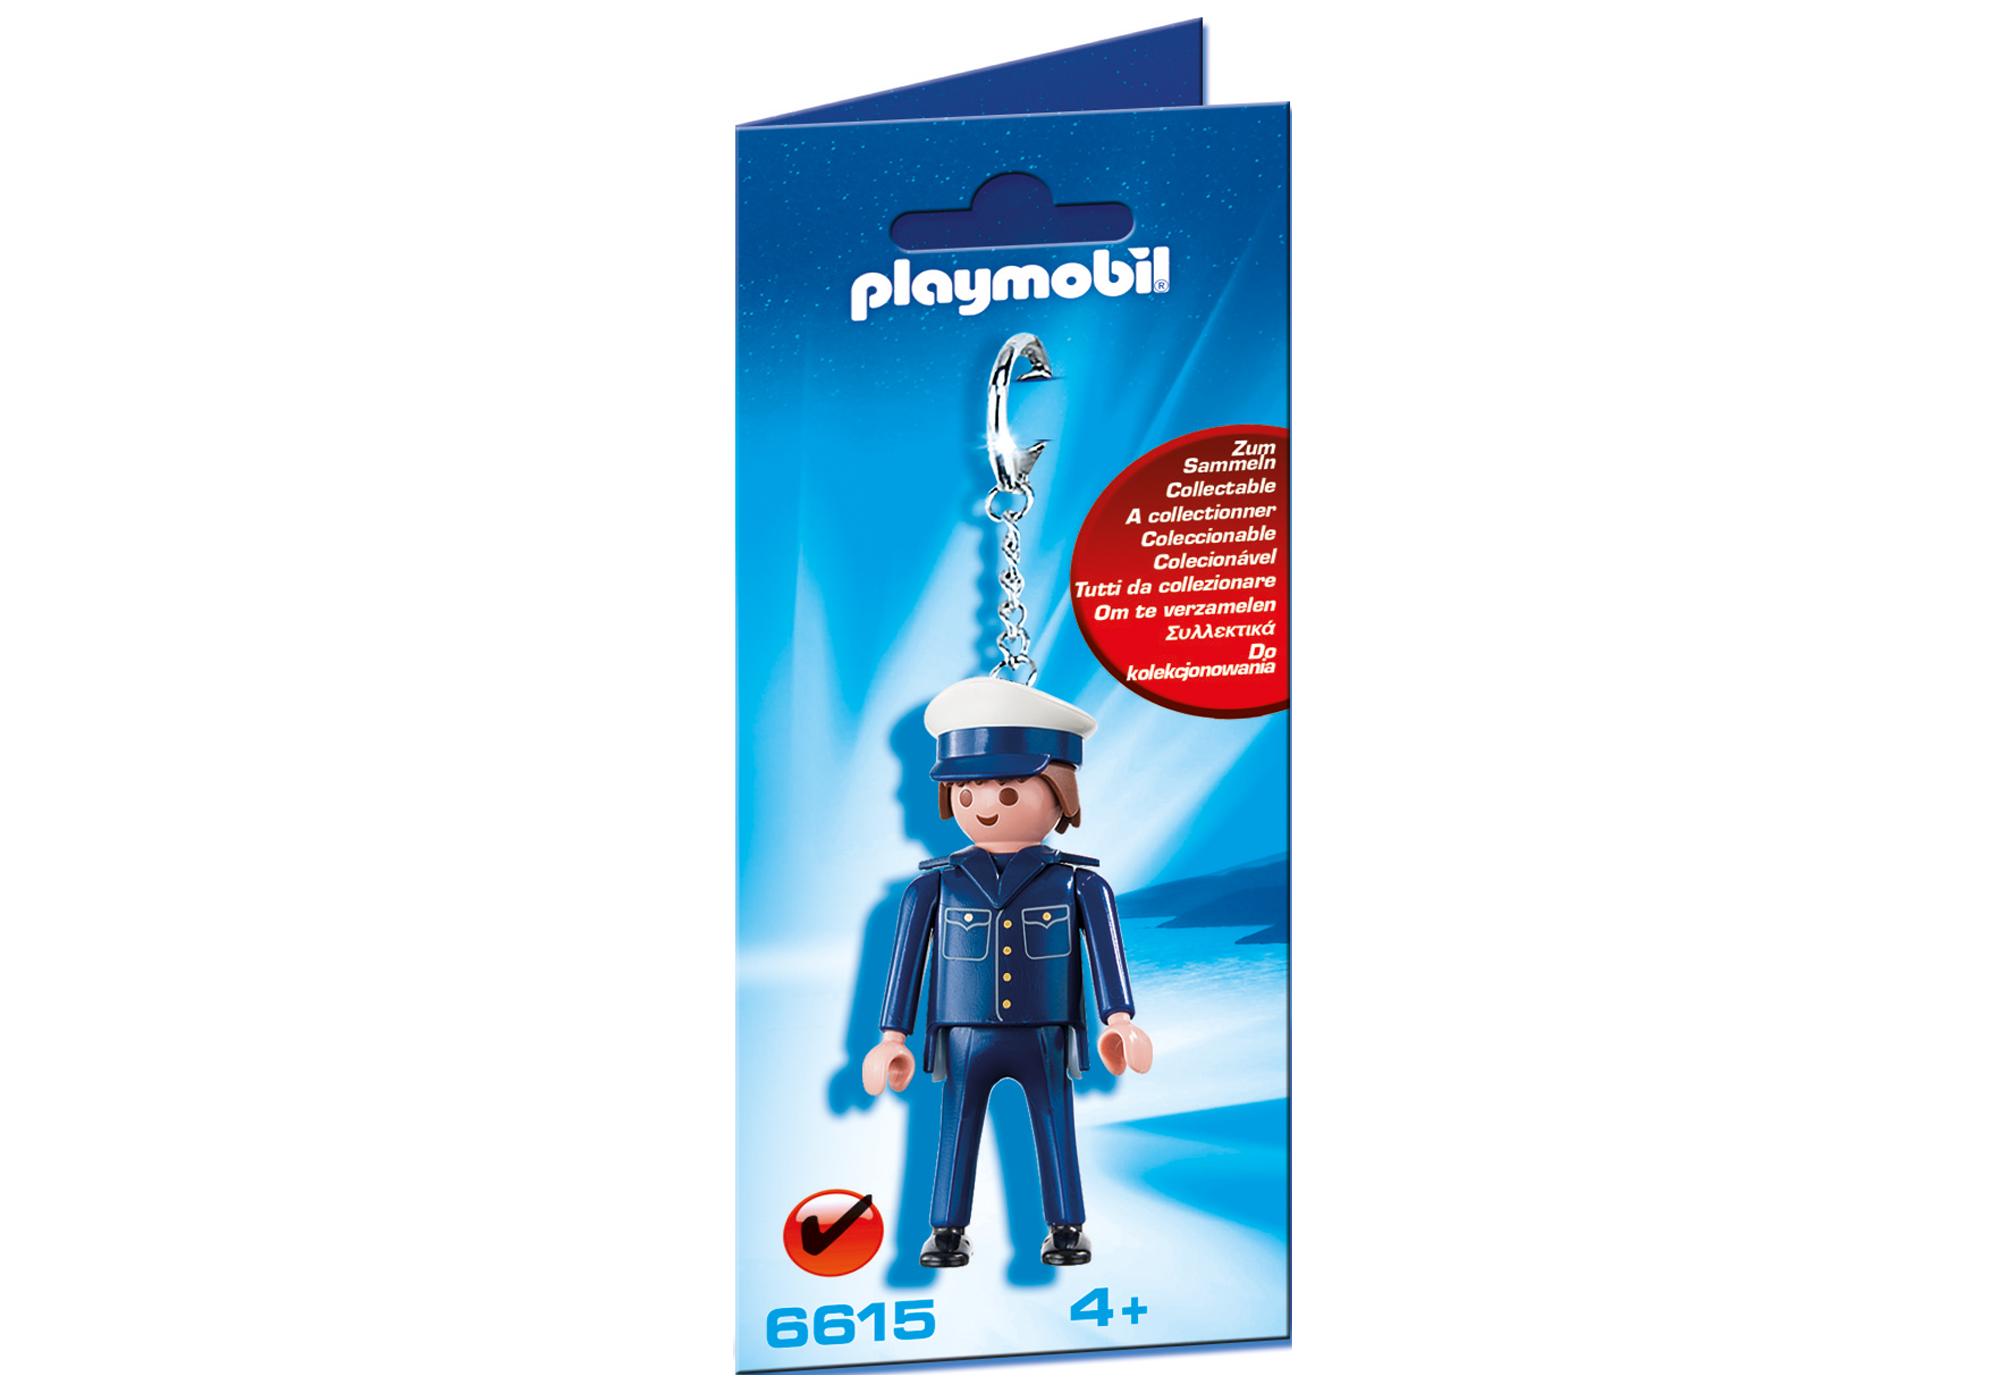 http://media.playmobil.com/i/playmobil/6615_product_box_front